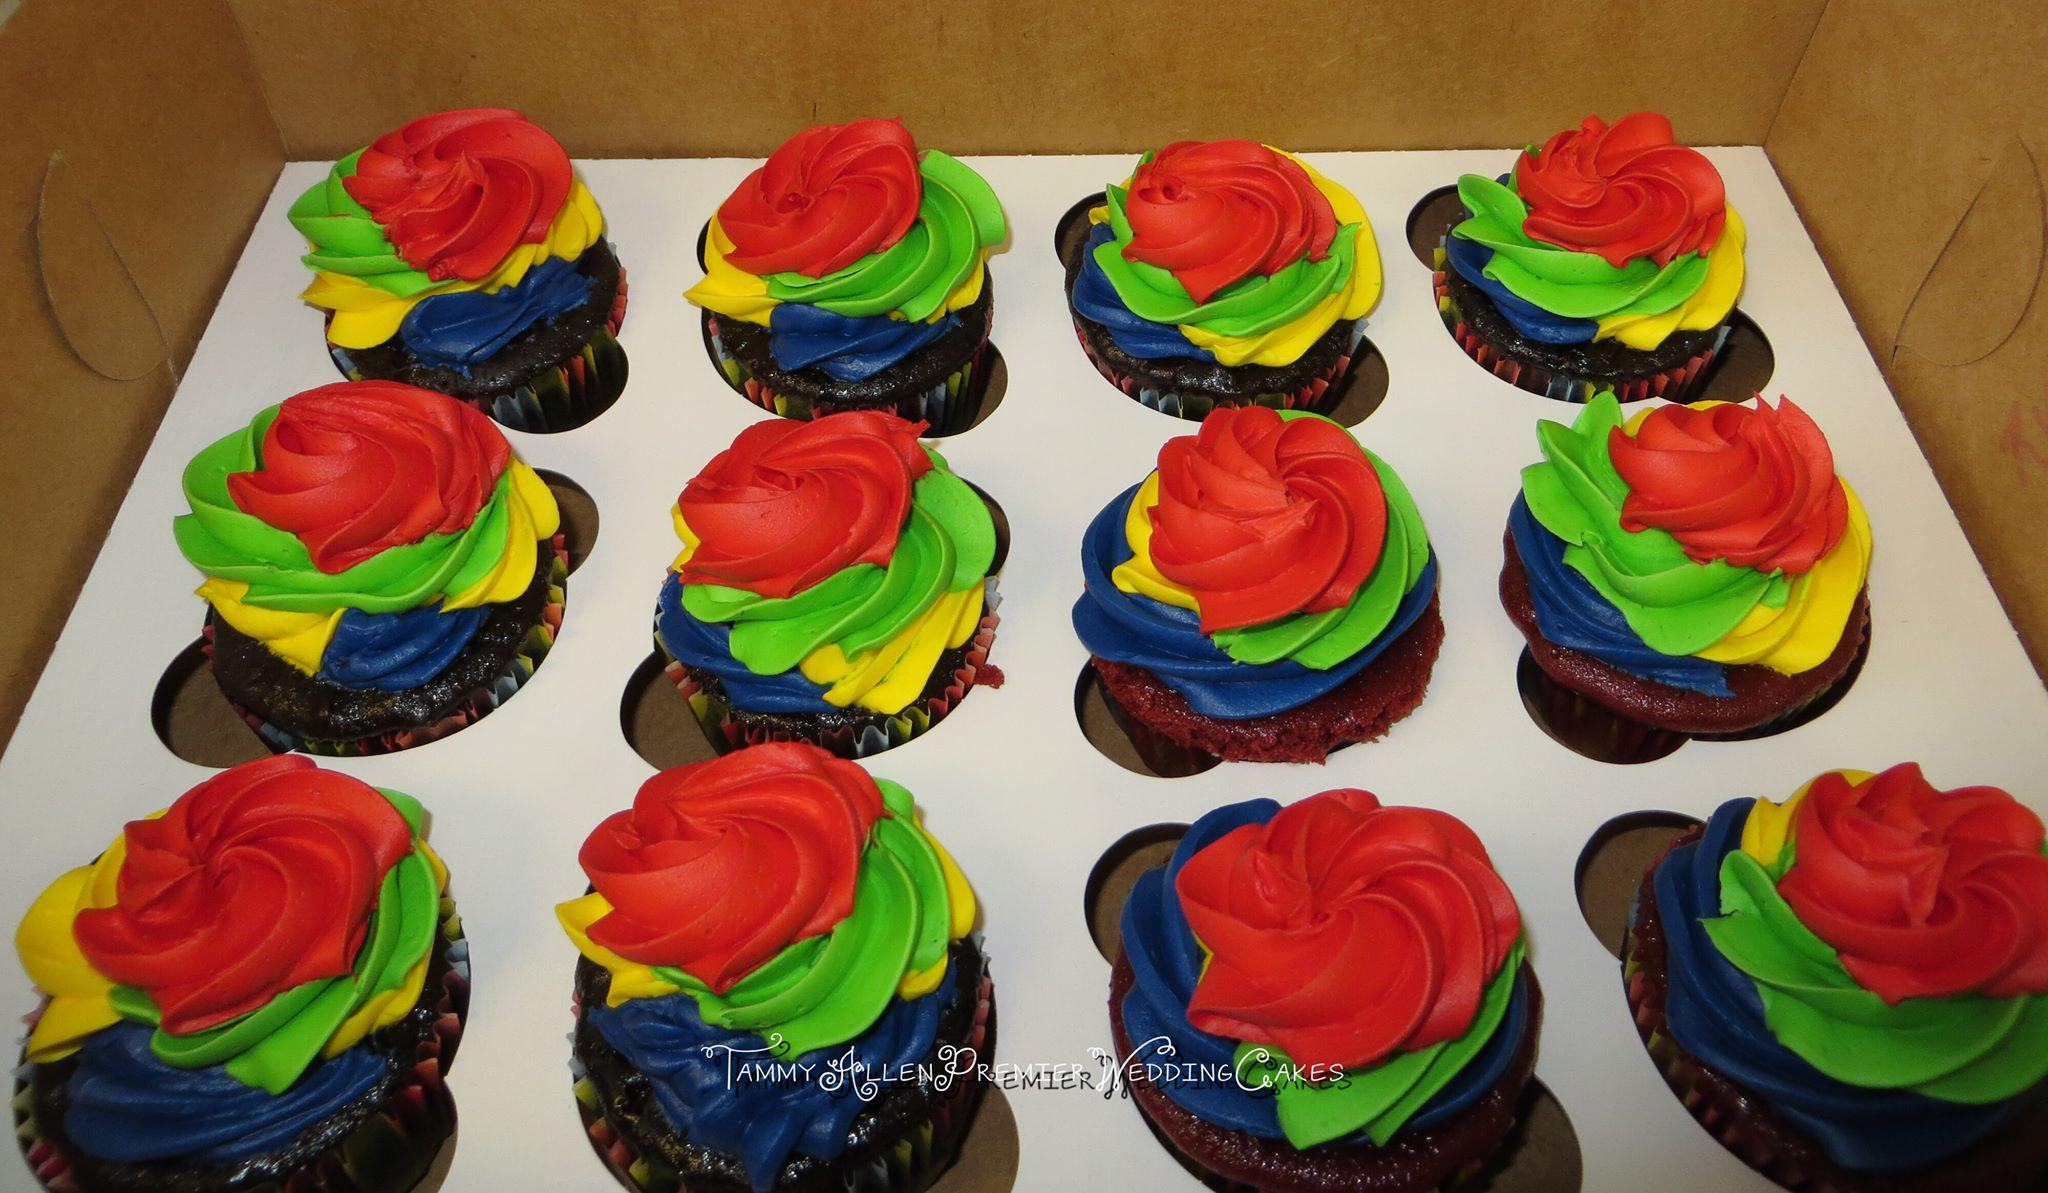 Wedding Cakes by Tammy Allen Houston (281)861-7995